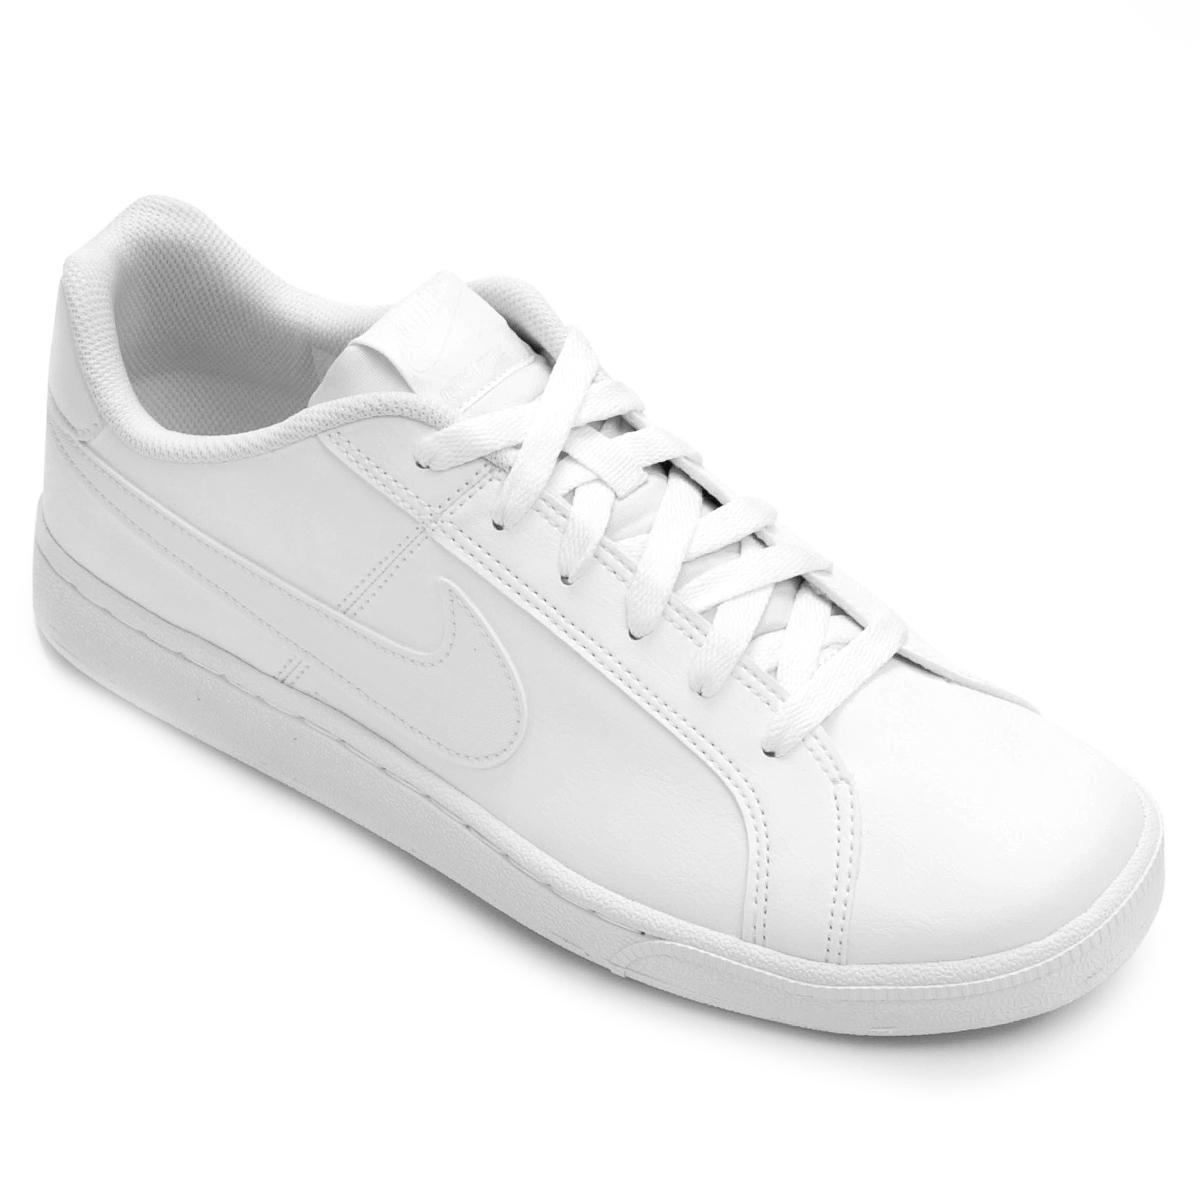 effc2b39c Tênis Couro Nike Court Royale Masculino - Branco | Shop Timão